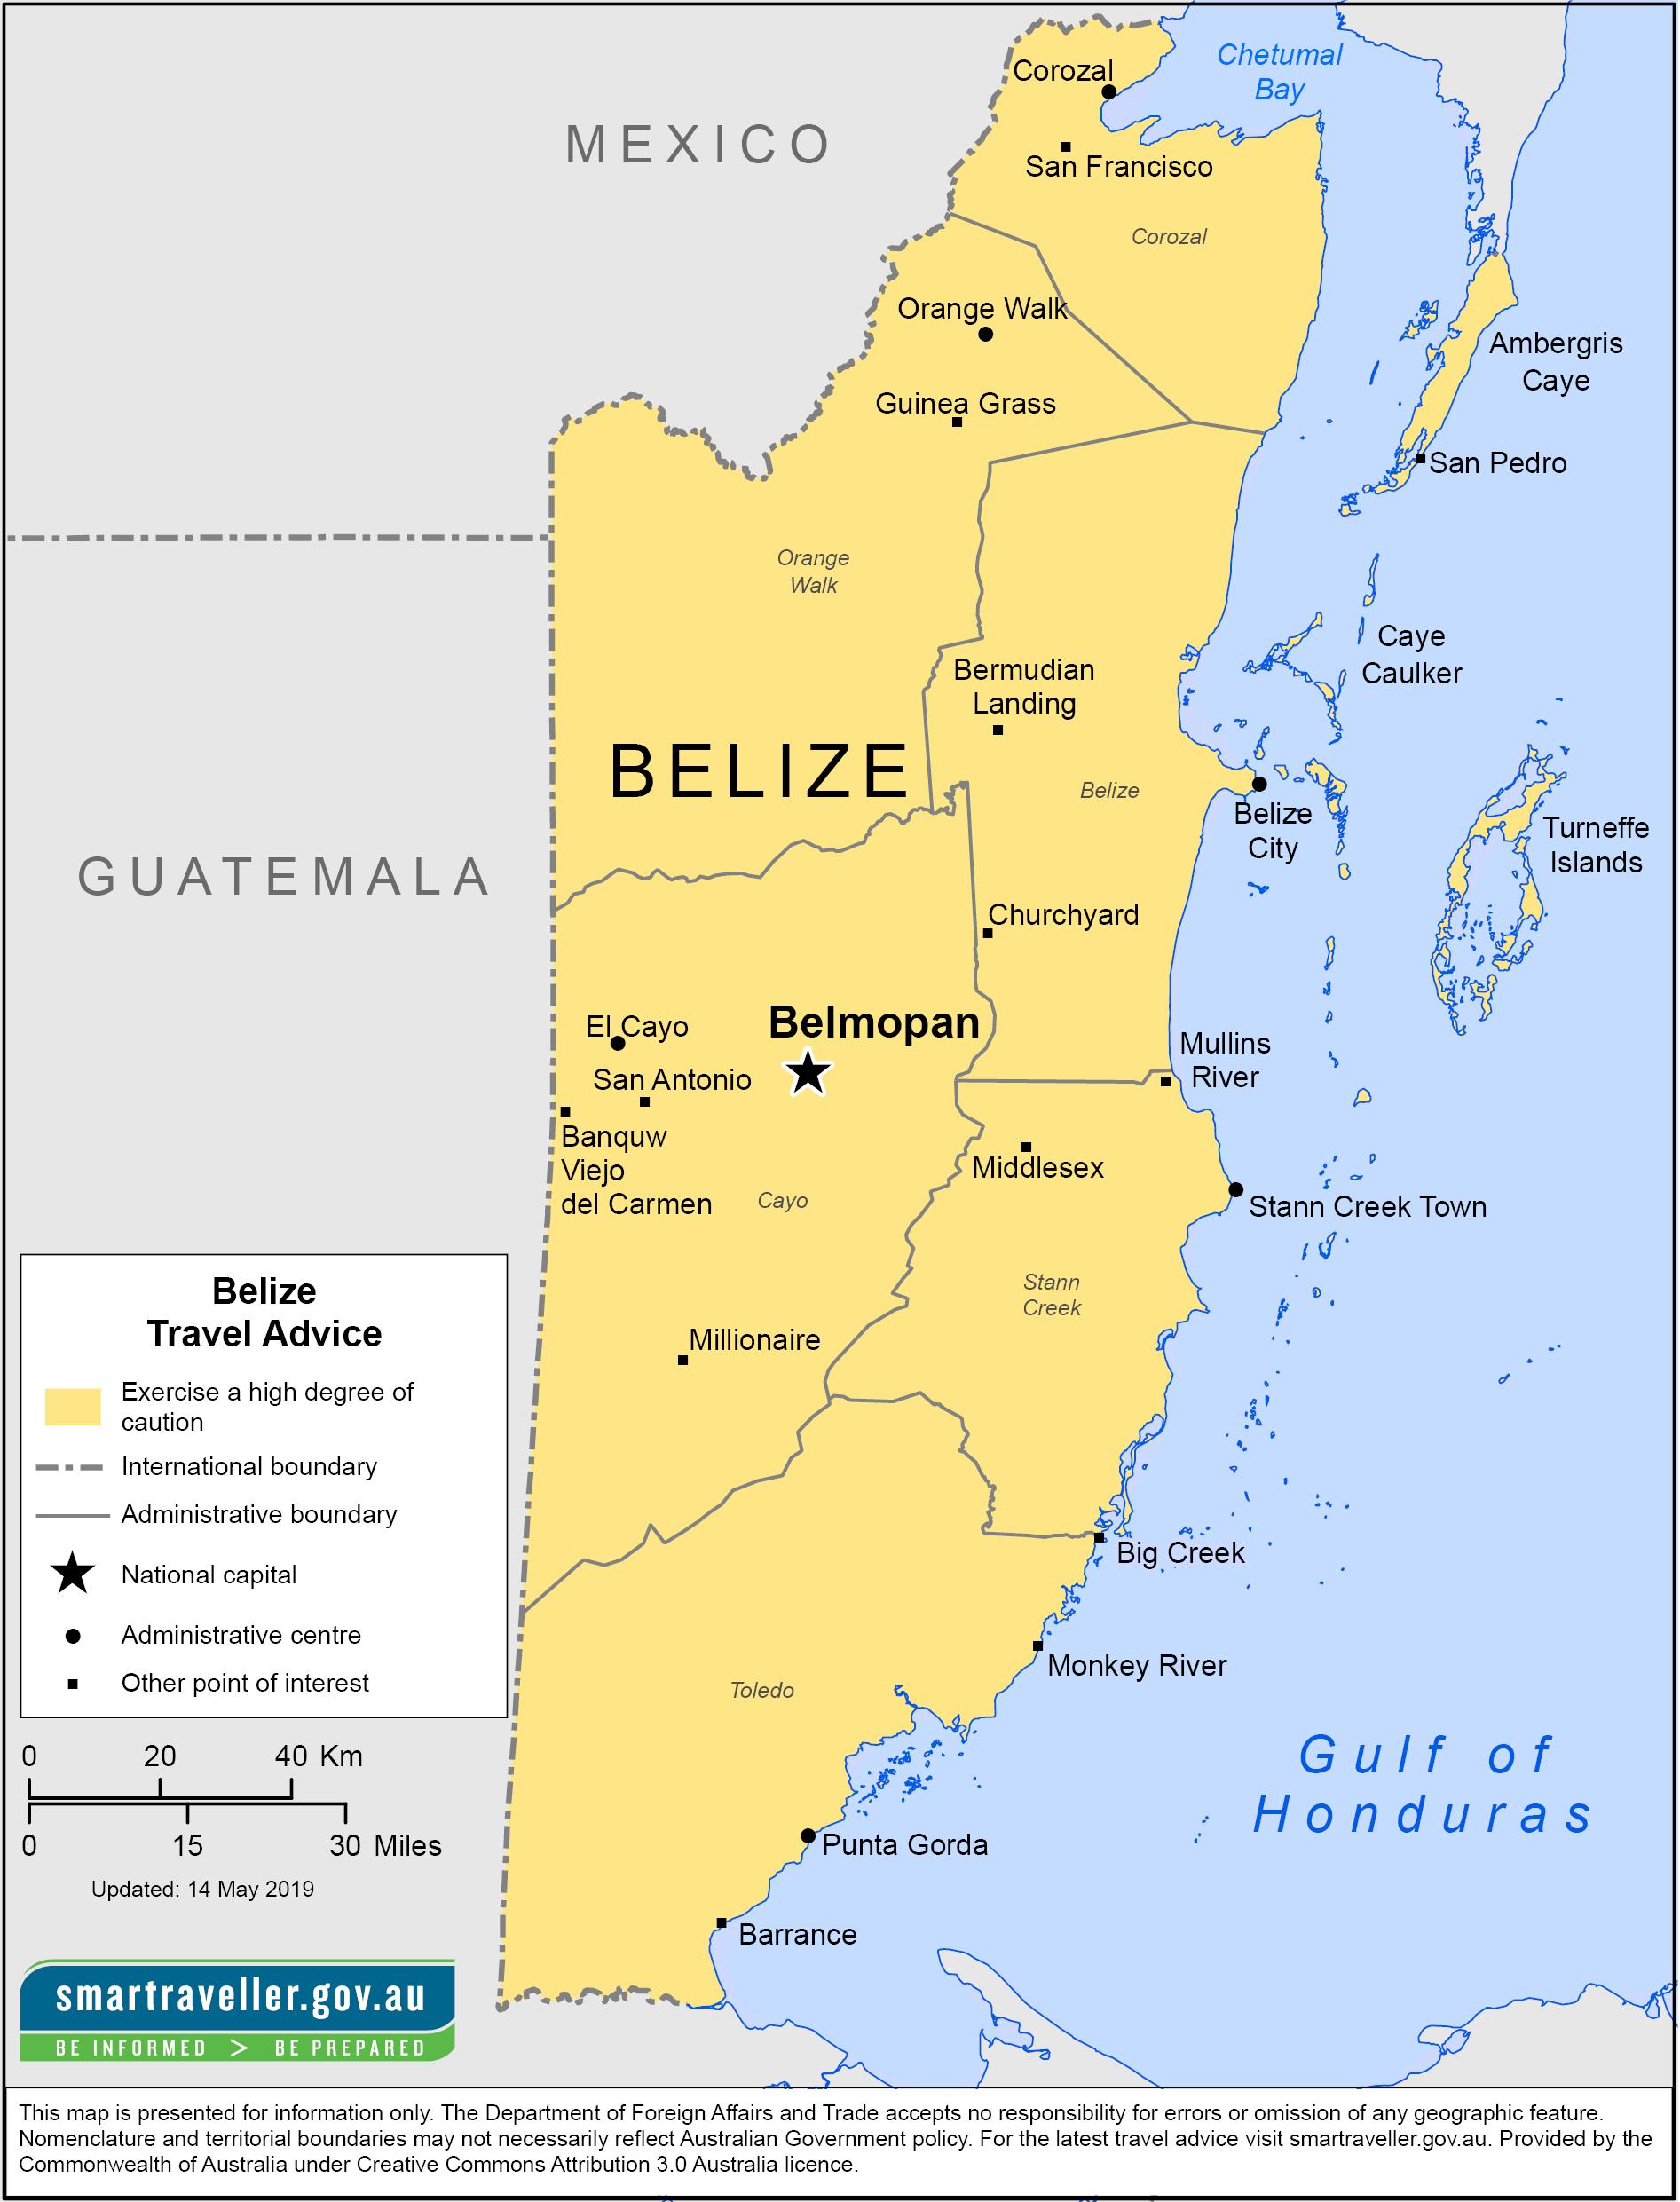 Belize-Travel-Health-Insurance